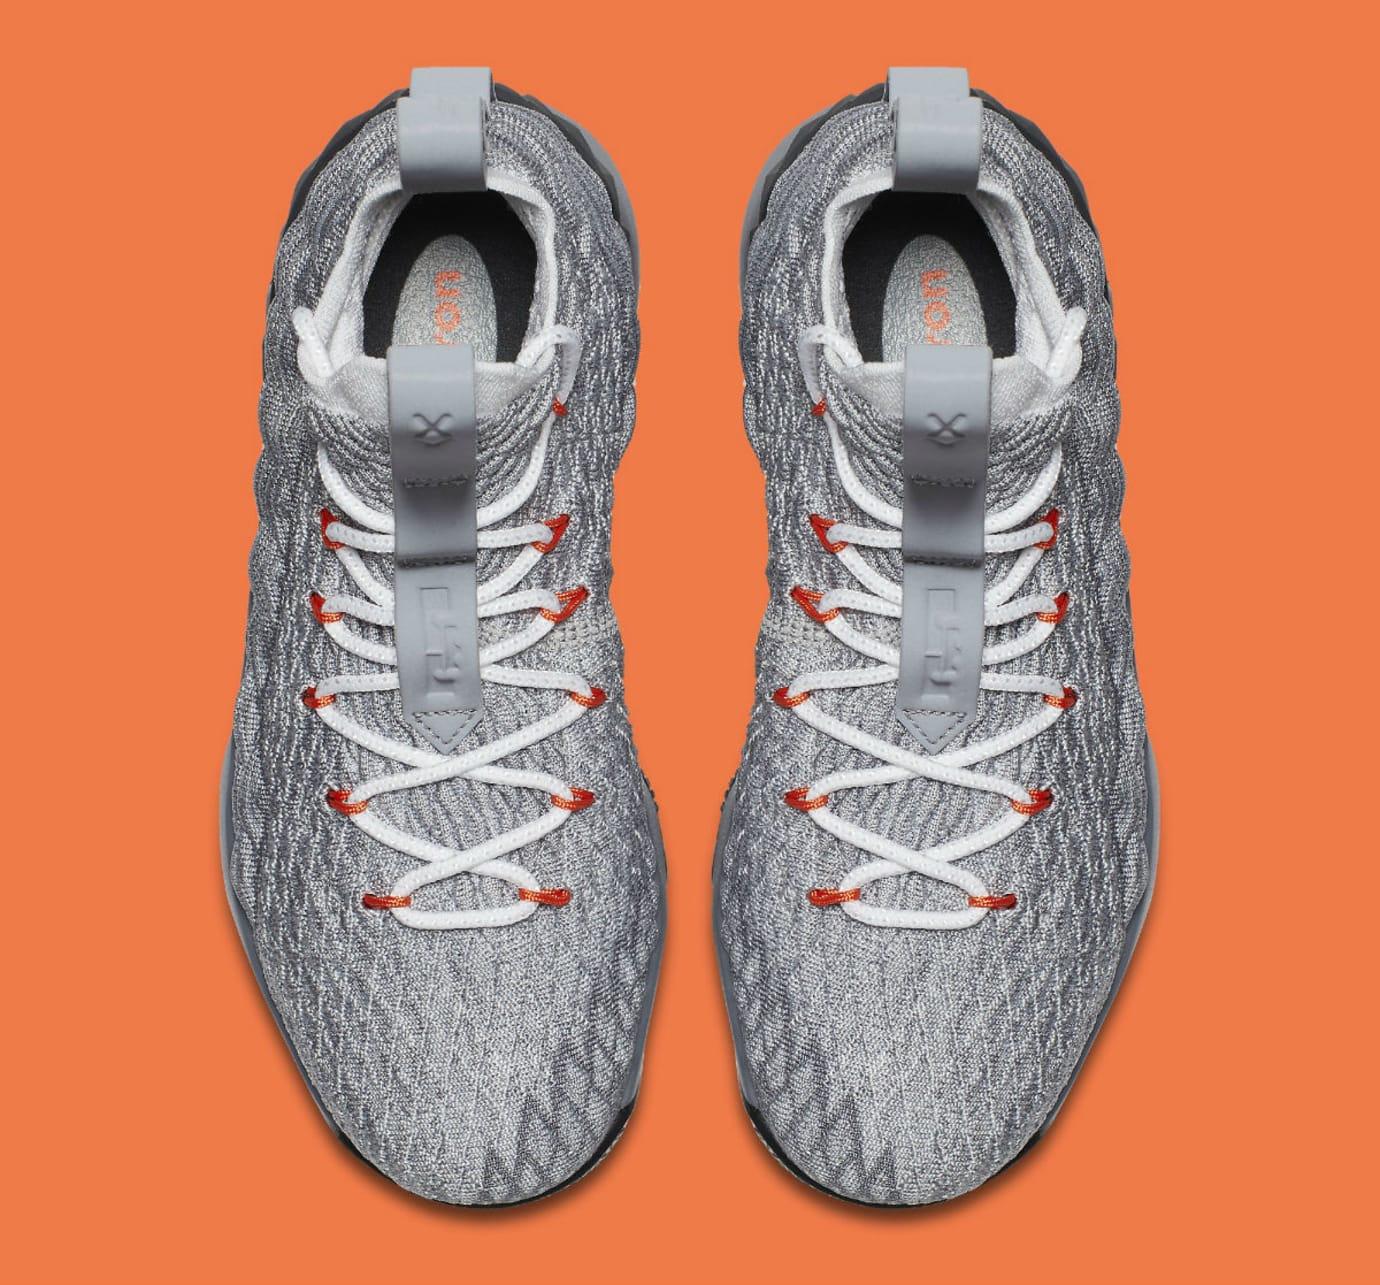 9936ab019b1 Nike LeBron 15 GS Black Safety Orange Dark Grey Wolf Grey Release Date  922911-080